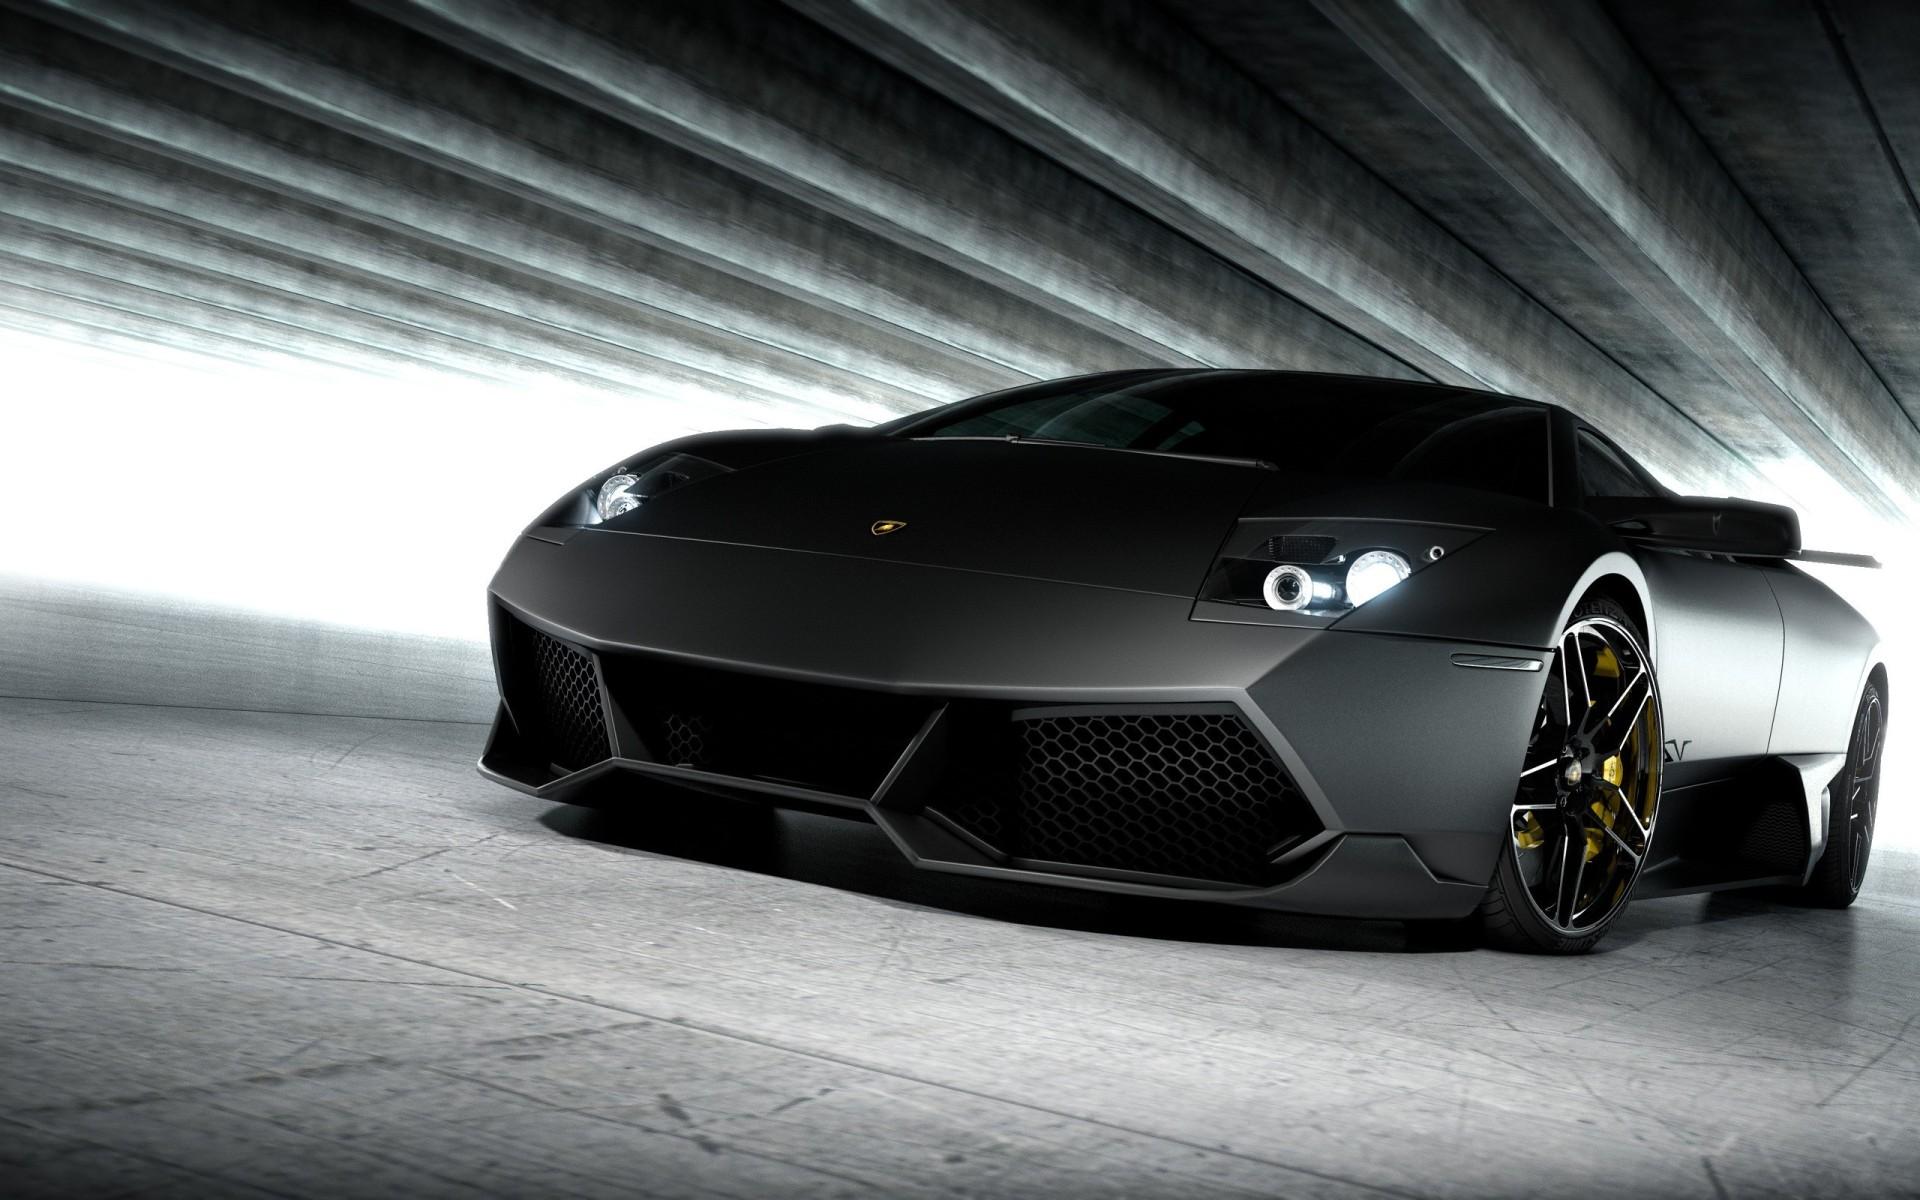 Wallpaper Lamborghini Murciélago Negro